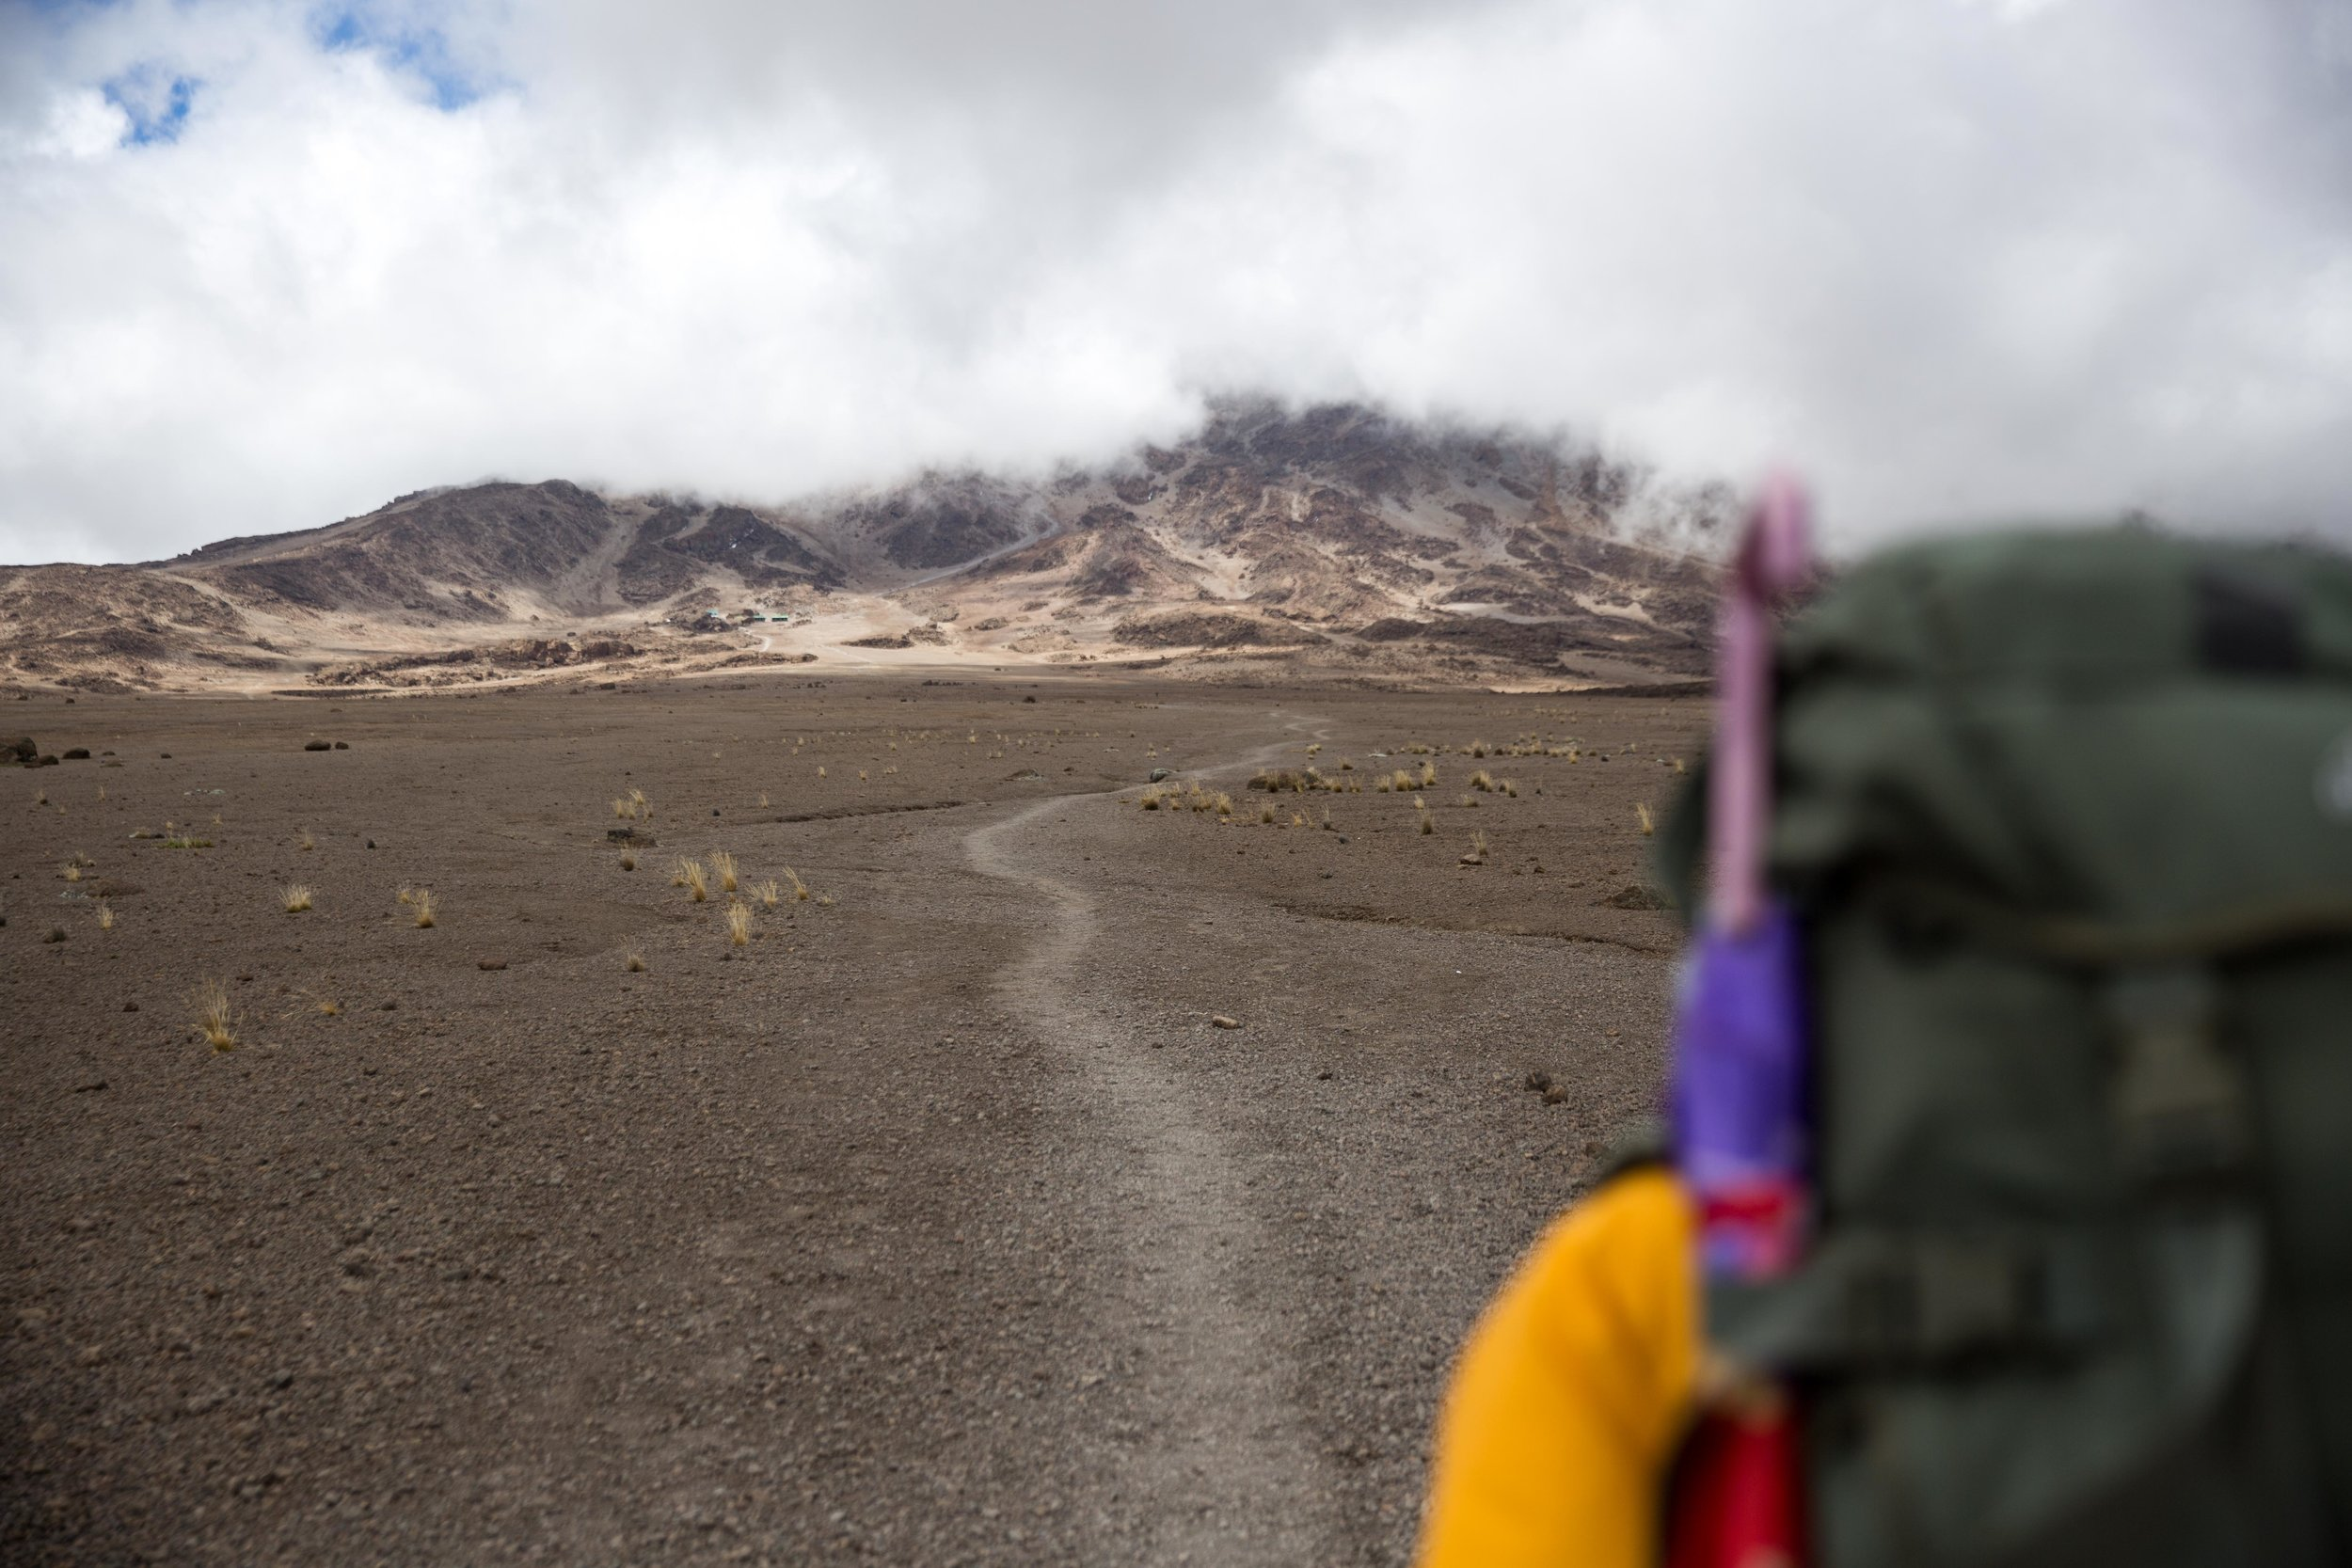 ajw_REI_Kilimanjaro-38.jpg